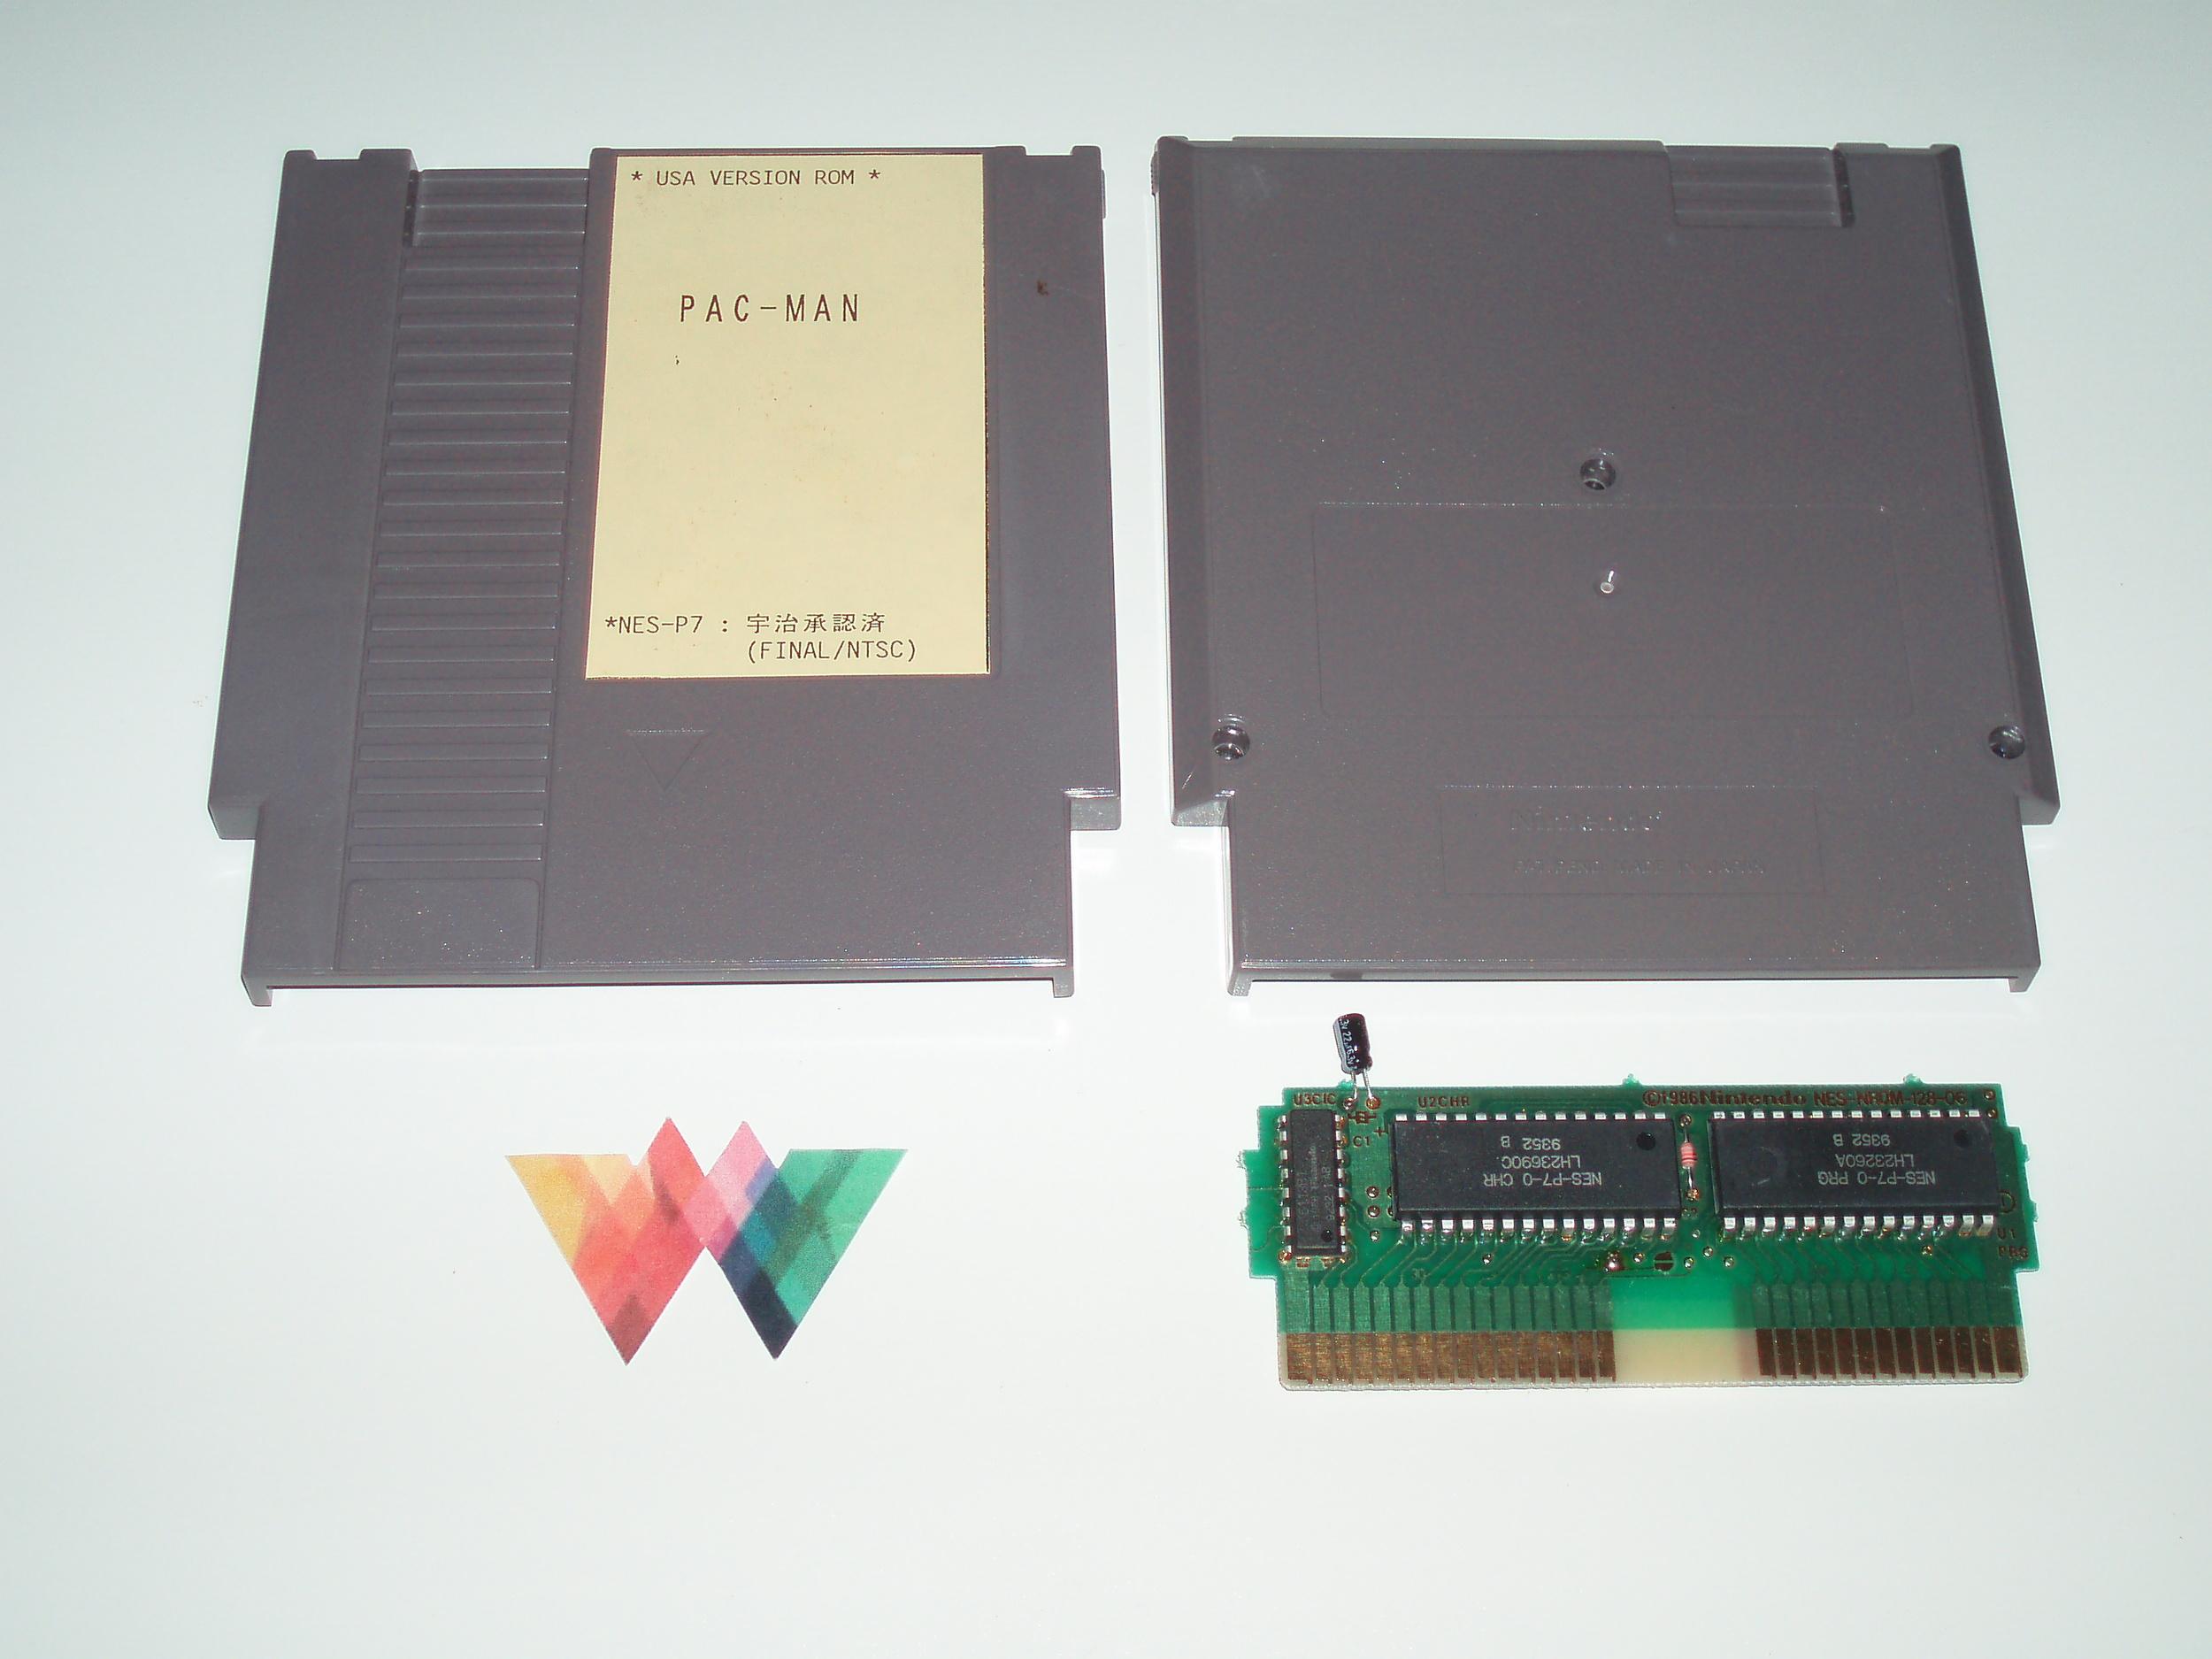 P1010079.JPG